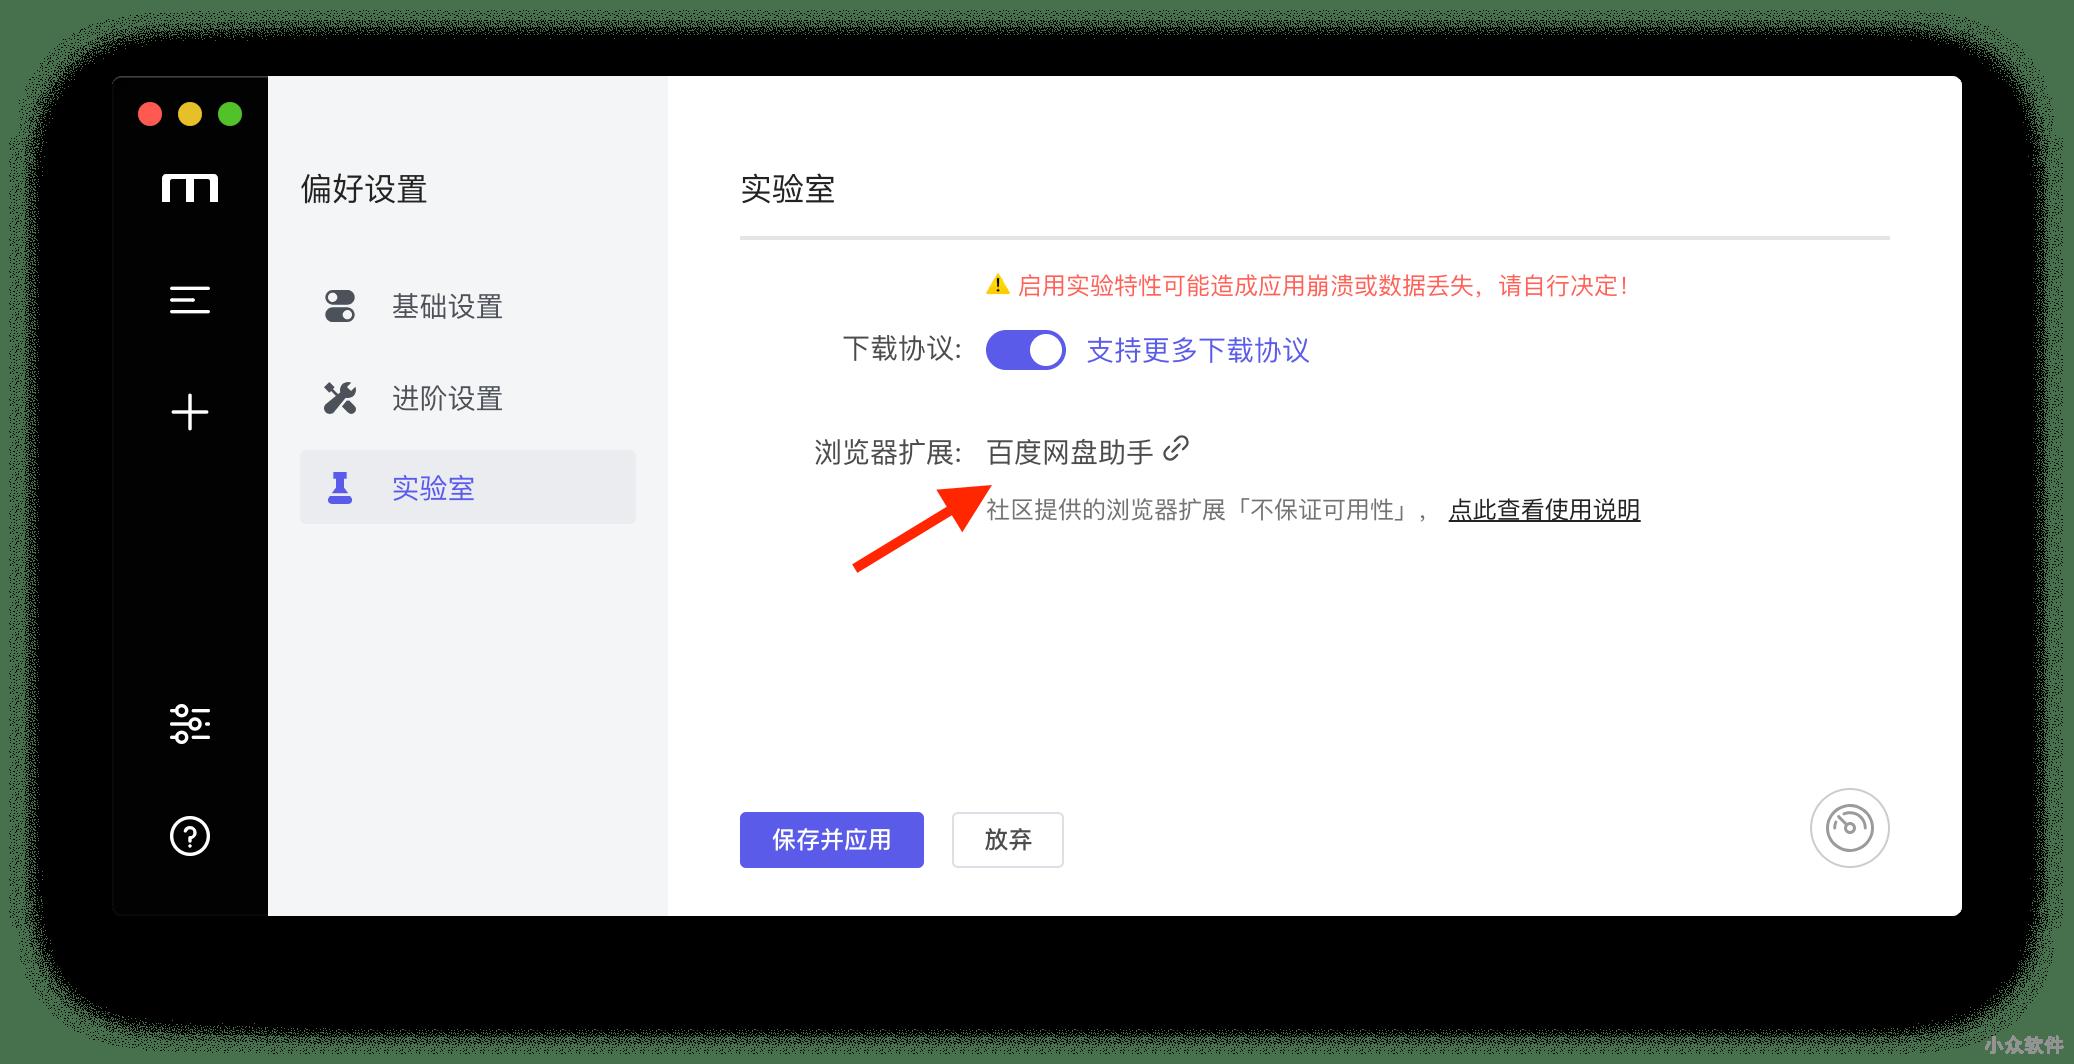 Motrix - 開源下載工具,支持BT、磁力鏈、百度盤下載[Win/macOS/Linux] 3